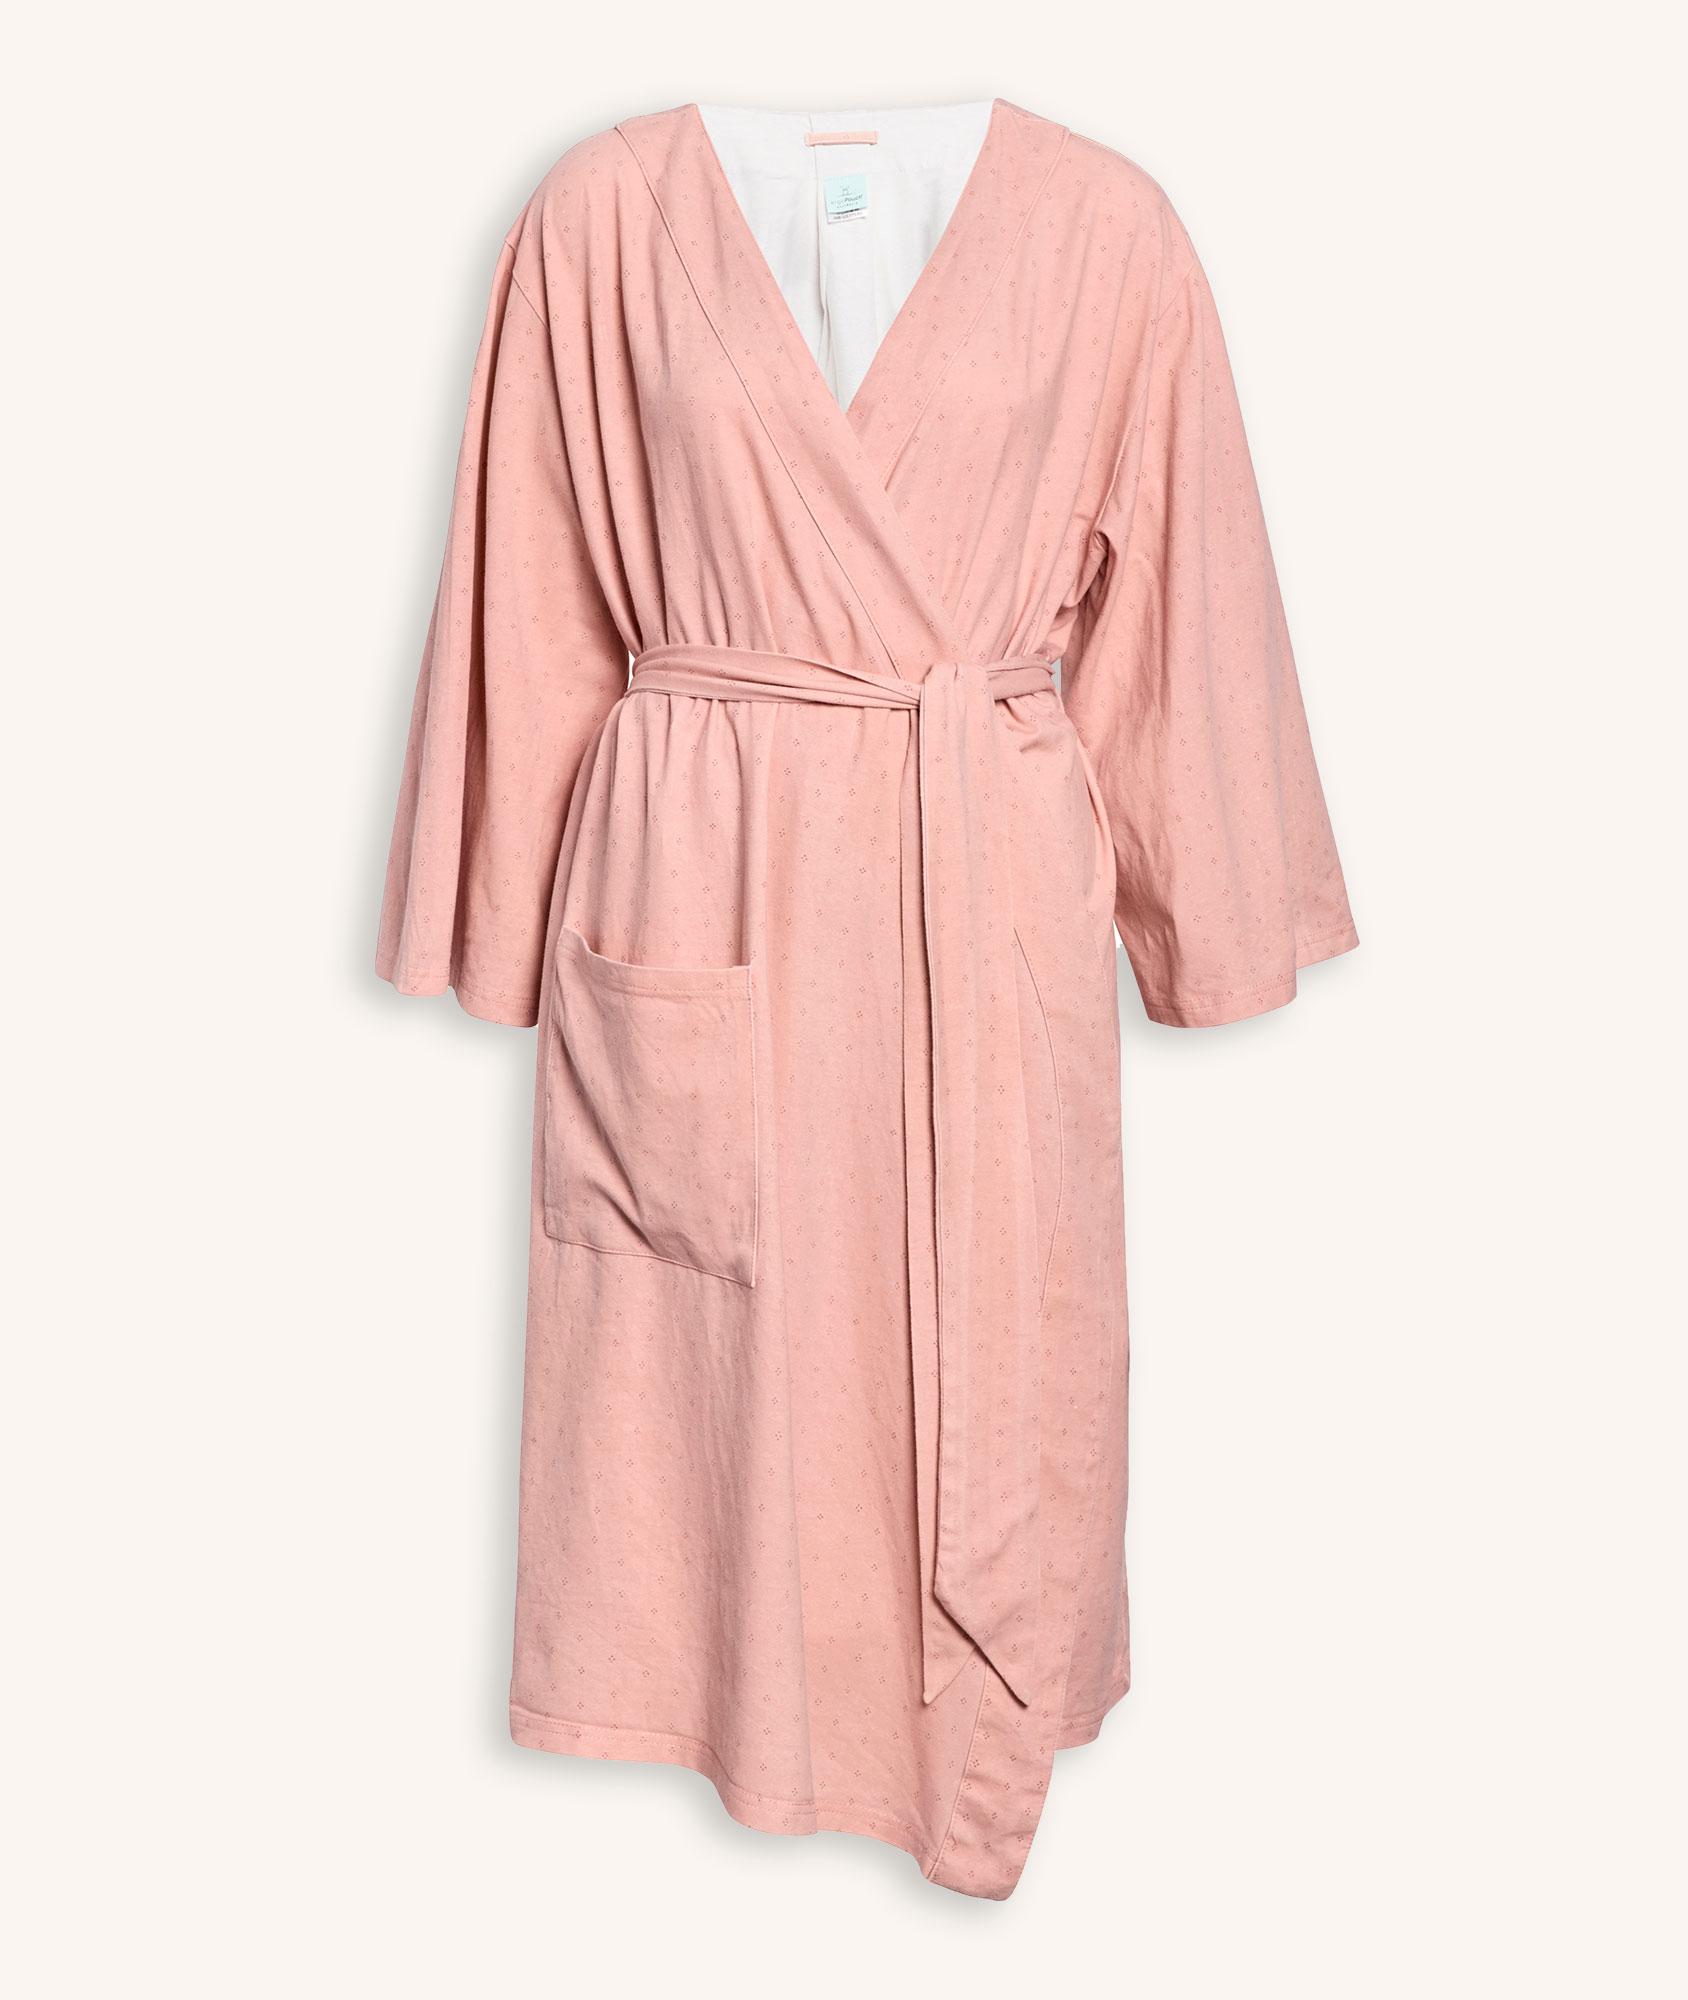 Matchy Matchy Robe